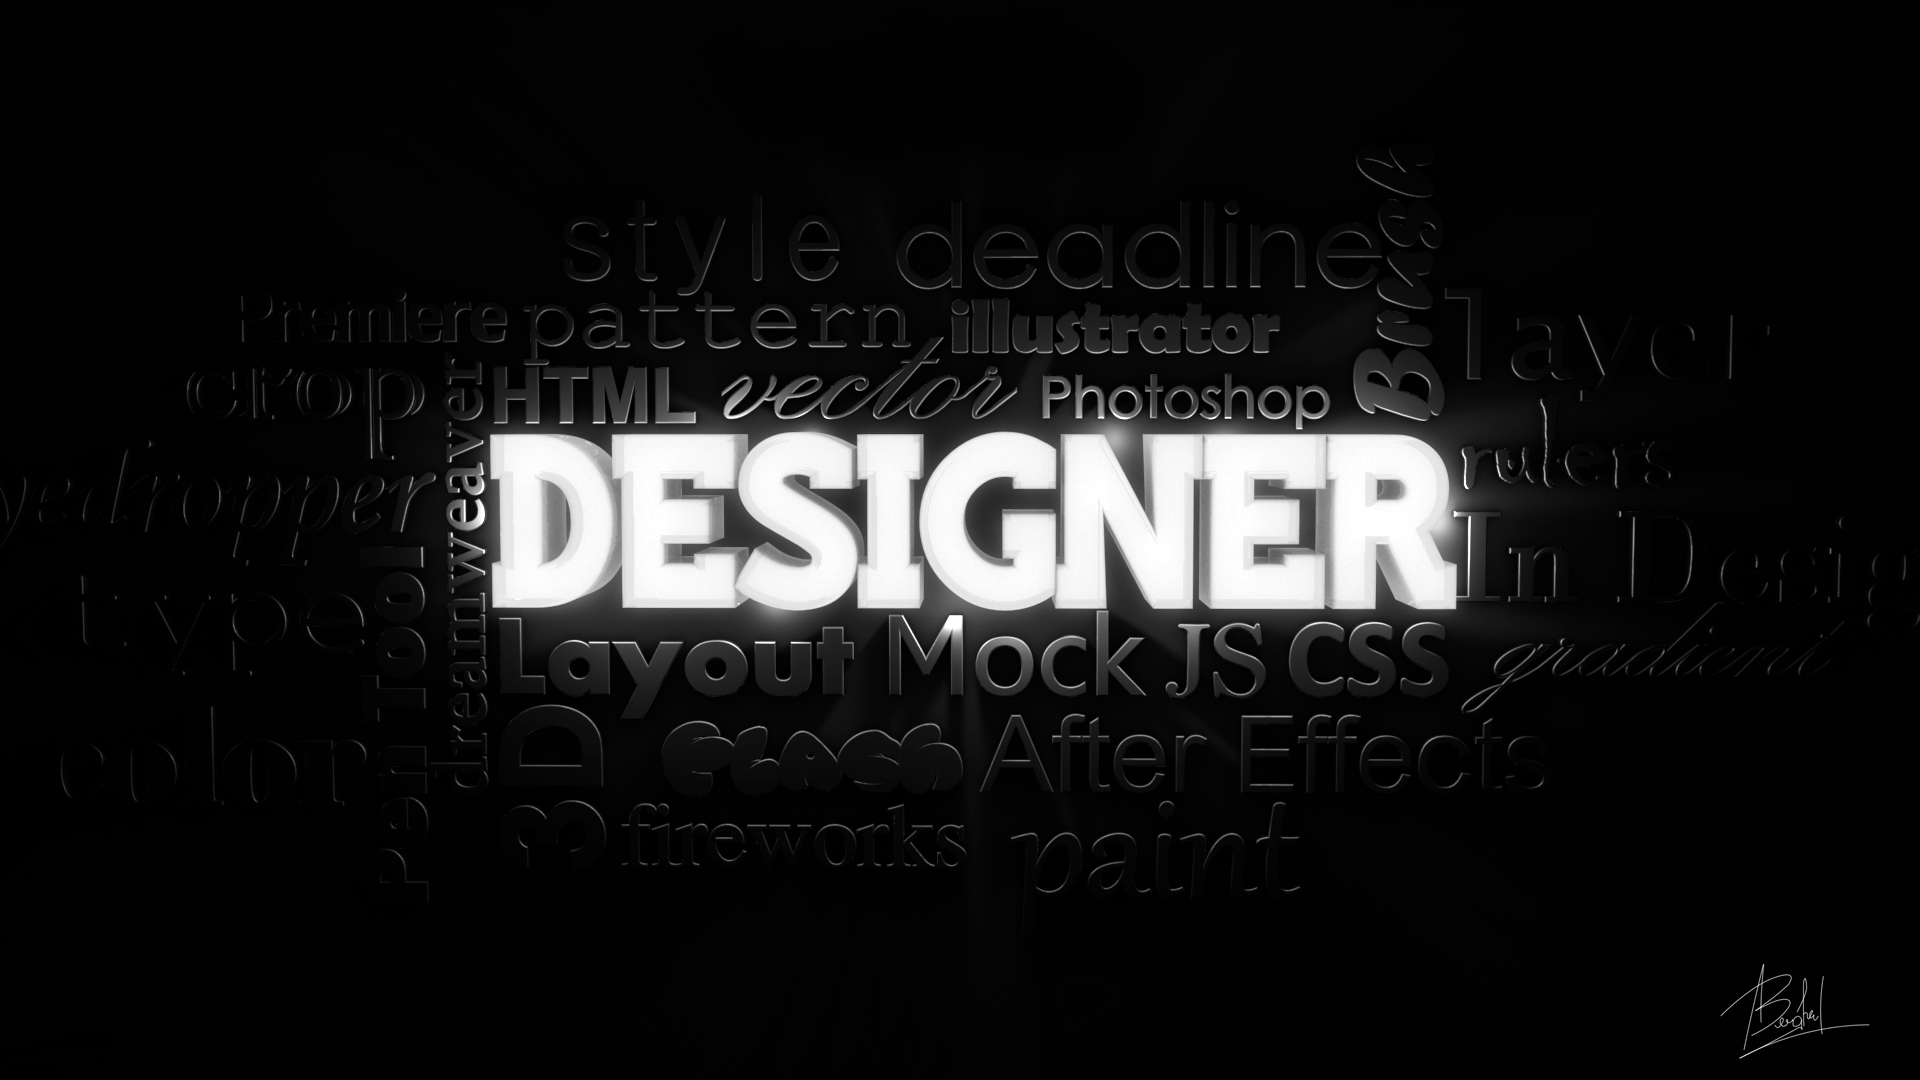 Designer wallpaper 3D by alin0090 1920x1080